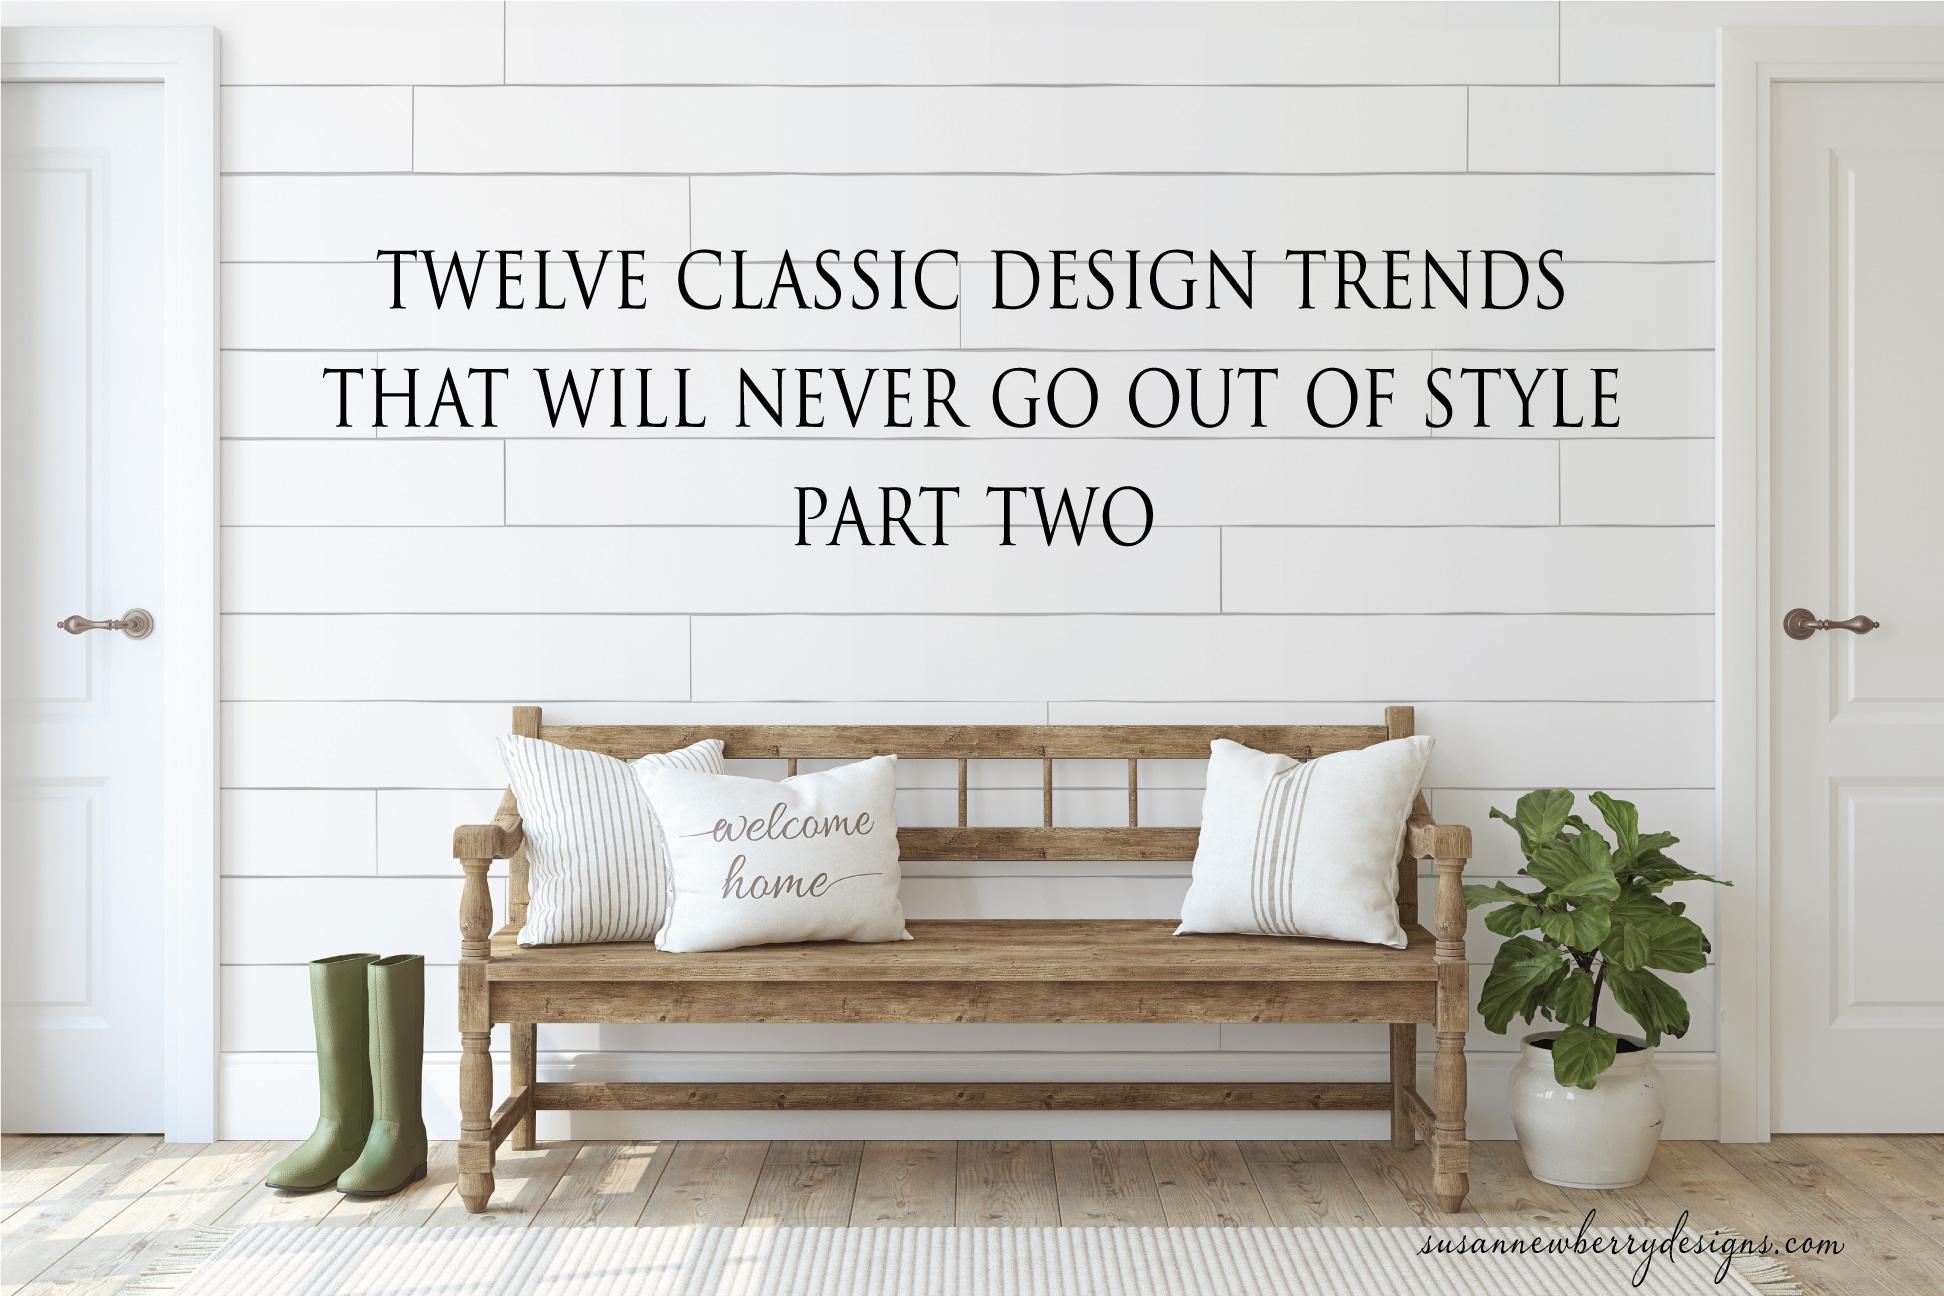 Design-Trends-Part-2.jpg